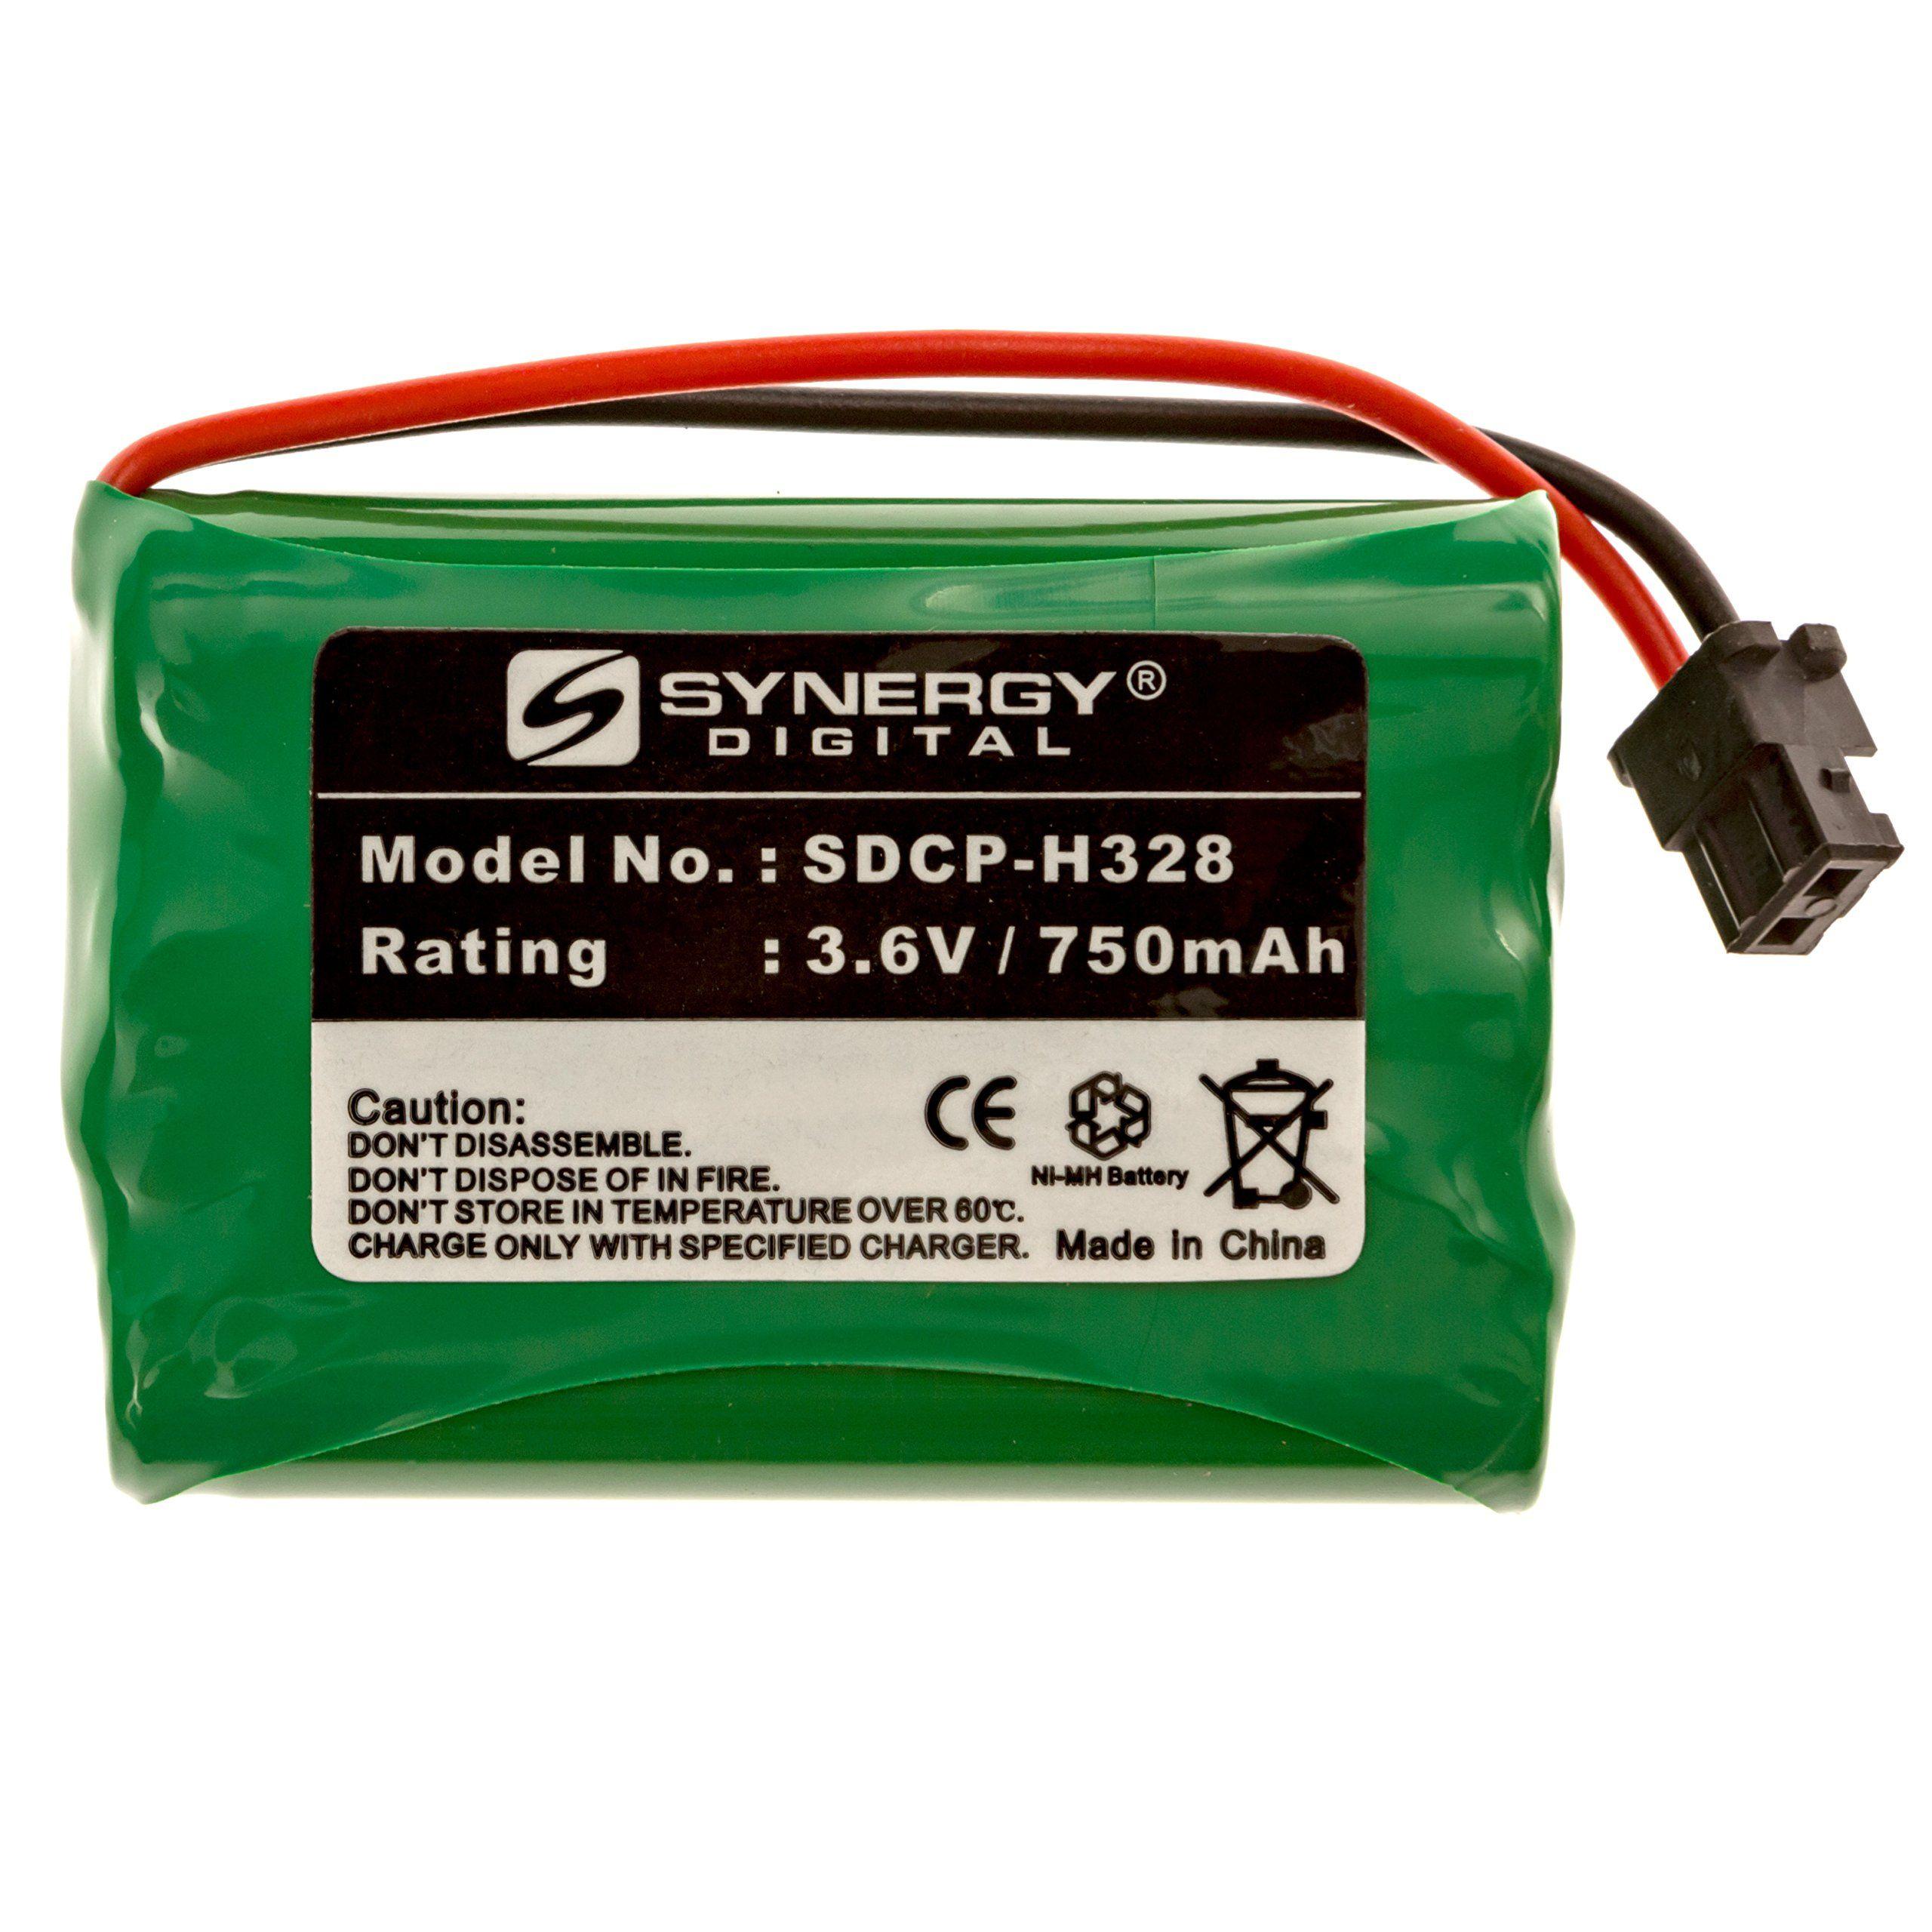 Synergy Digital Cordless Phone Battery Replacement For Gp Gp60aaah3bms 60aaah3bmx Gp55aaah3bmx Gp60aah3bmx Cordless Phone Cordless Phone Batteries Digital